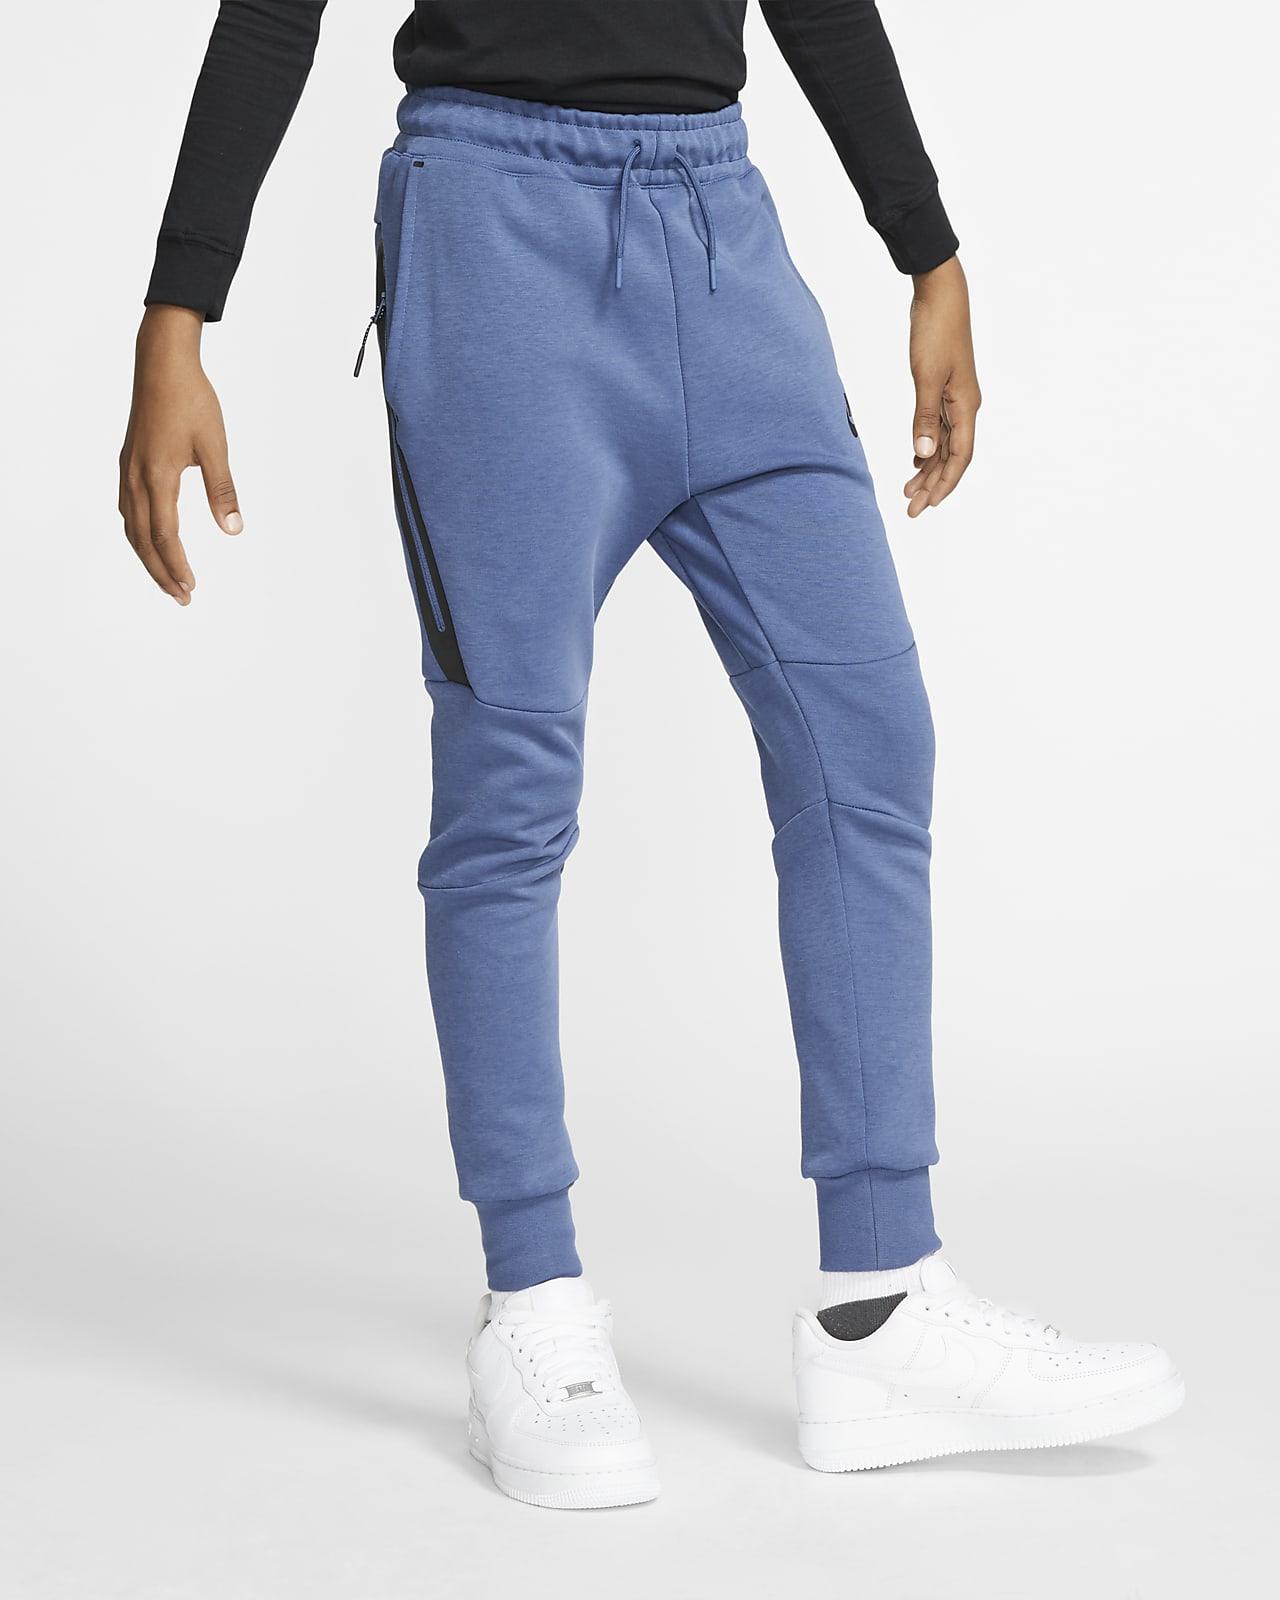 Duque Alentar capa  Pantalon en tissu Tech Fleece Nike Sportswear pour Enfant plus âgé. Nike CA